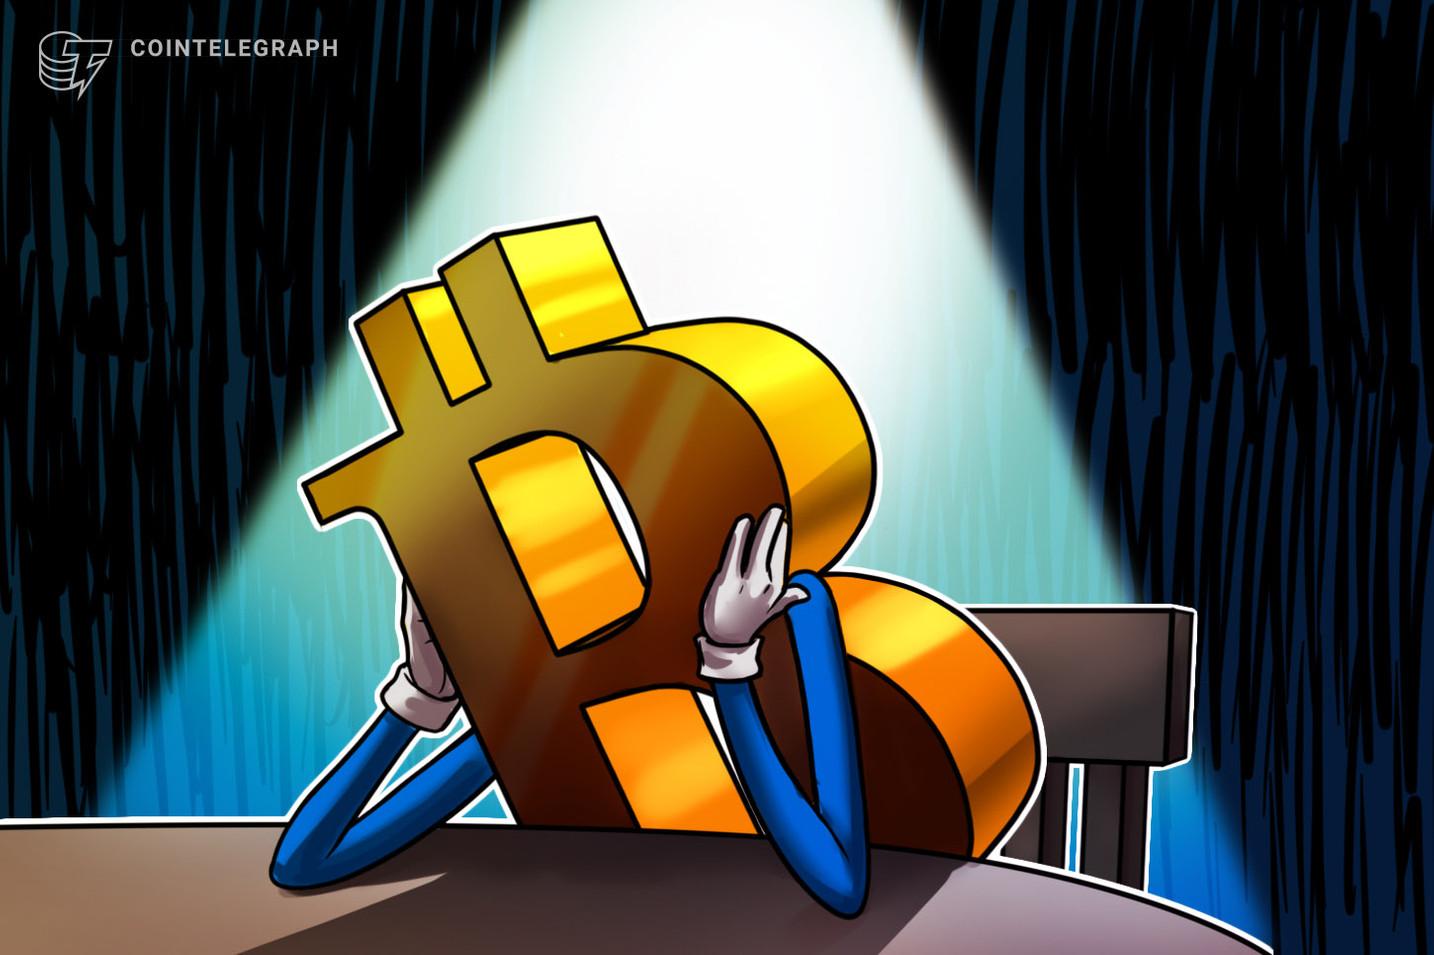 Veteran trader Peter Brandt sees Bitcoin crashing further after May's 50% drop